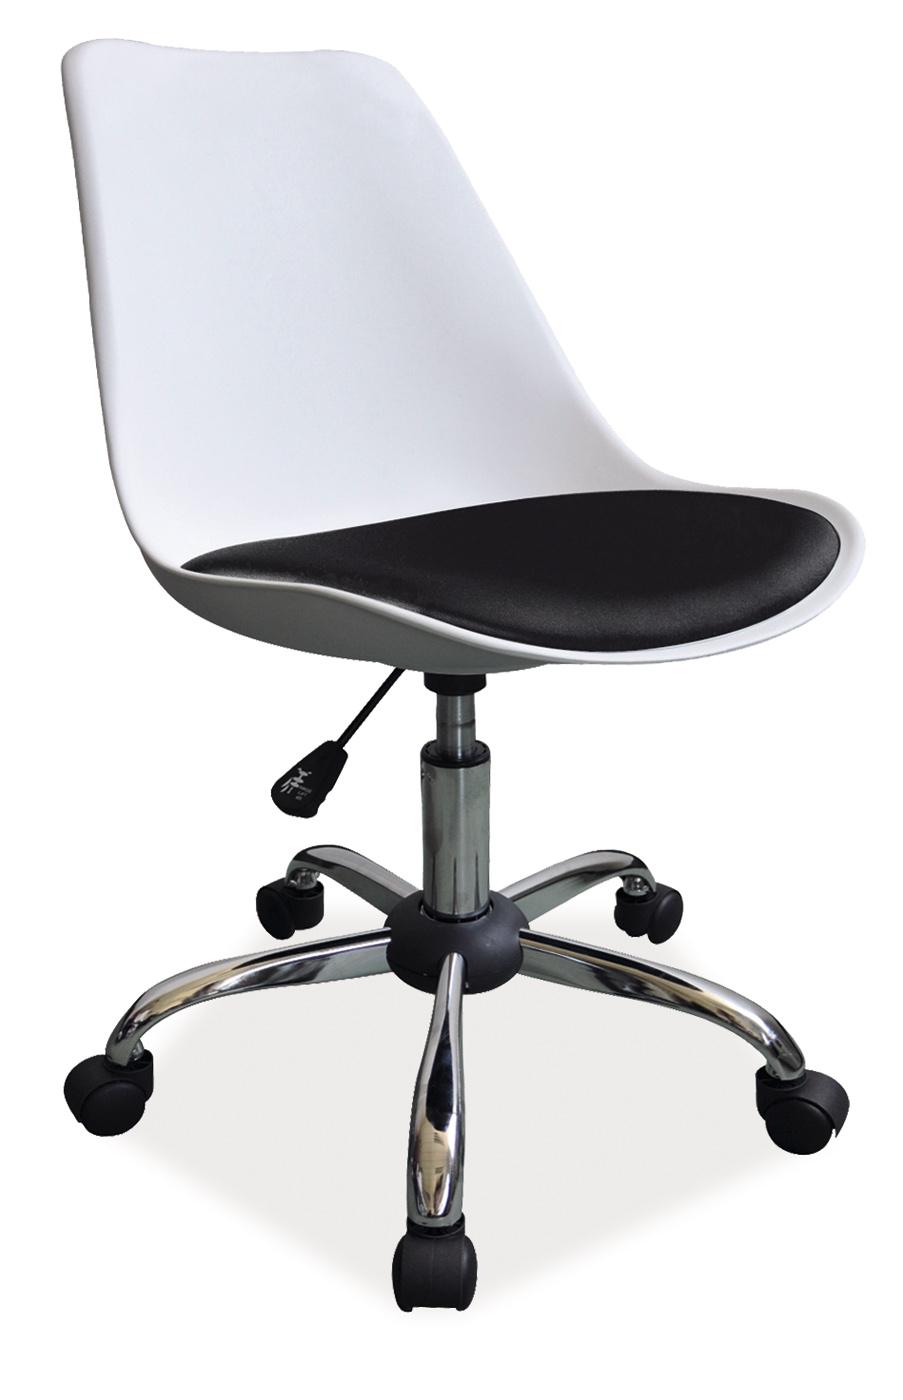 Signal Kancelárska stolička Q-777 Farba: Biela / čierna